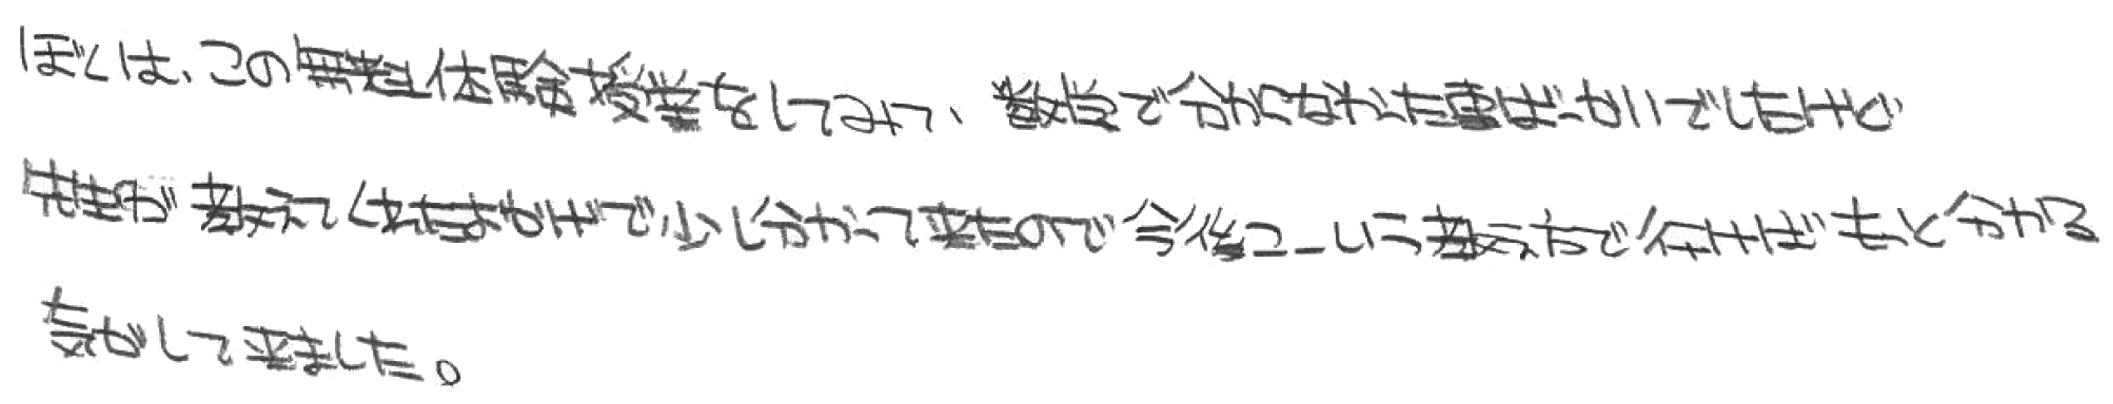 N君(松本市)からの口コミ